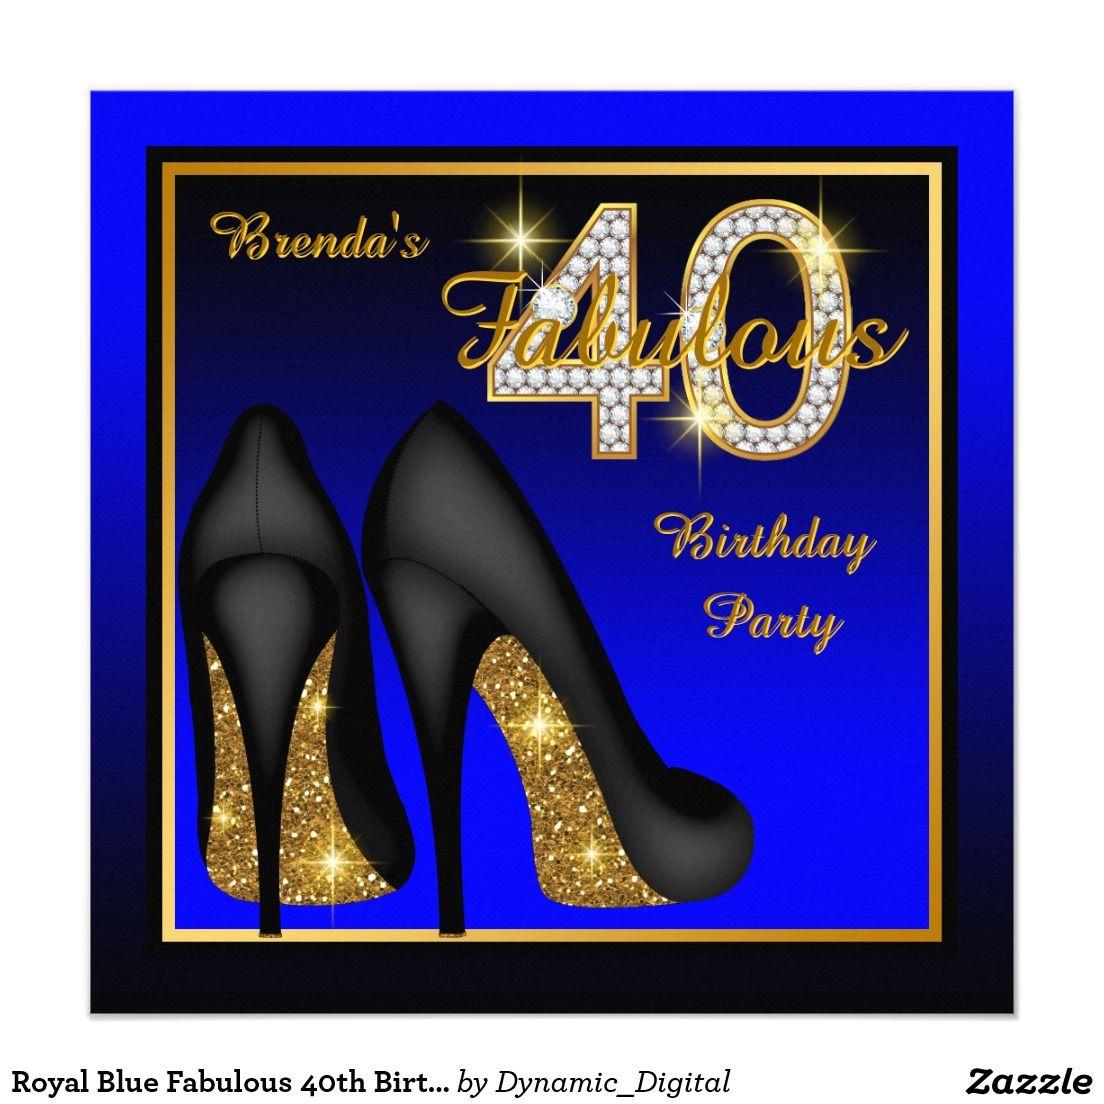 Royal Blue Fabulous 40th Birthday Party Invitation